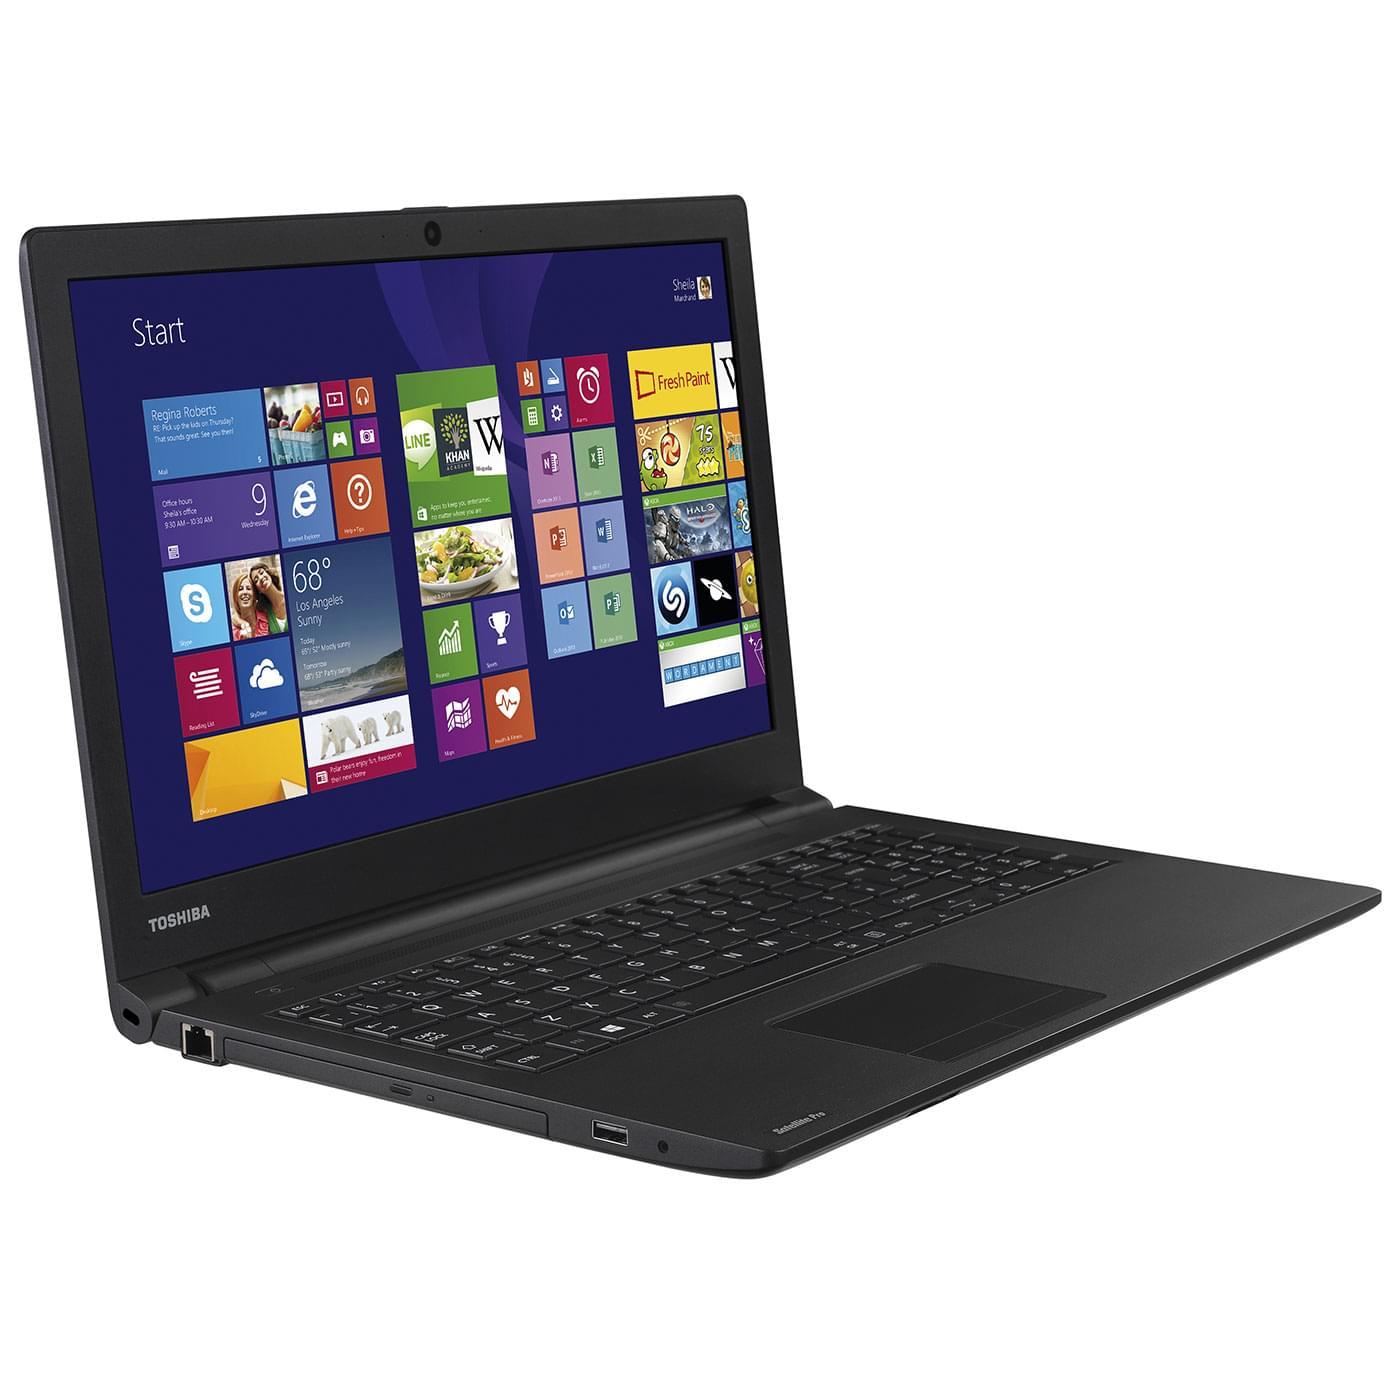 Toshiba R50-B-14P (PSSG2E-00300WFR) - Achat / Vente PC Portable sur Cybertek.fr - 0